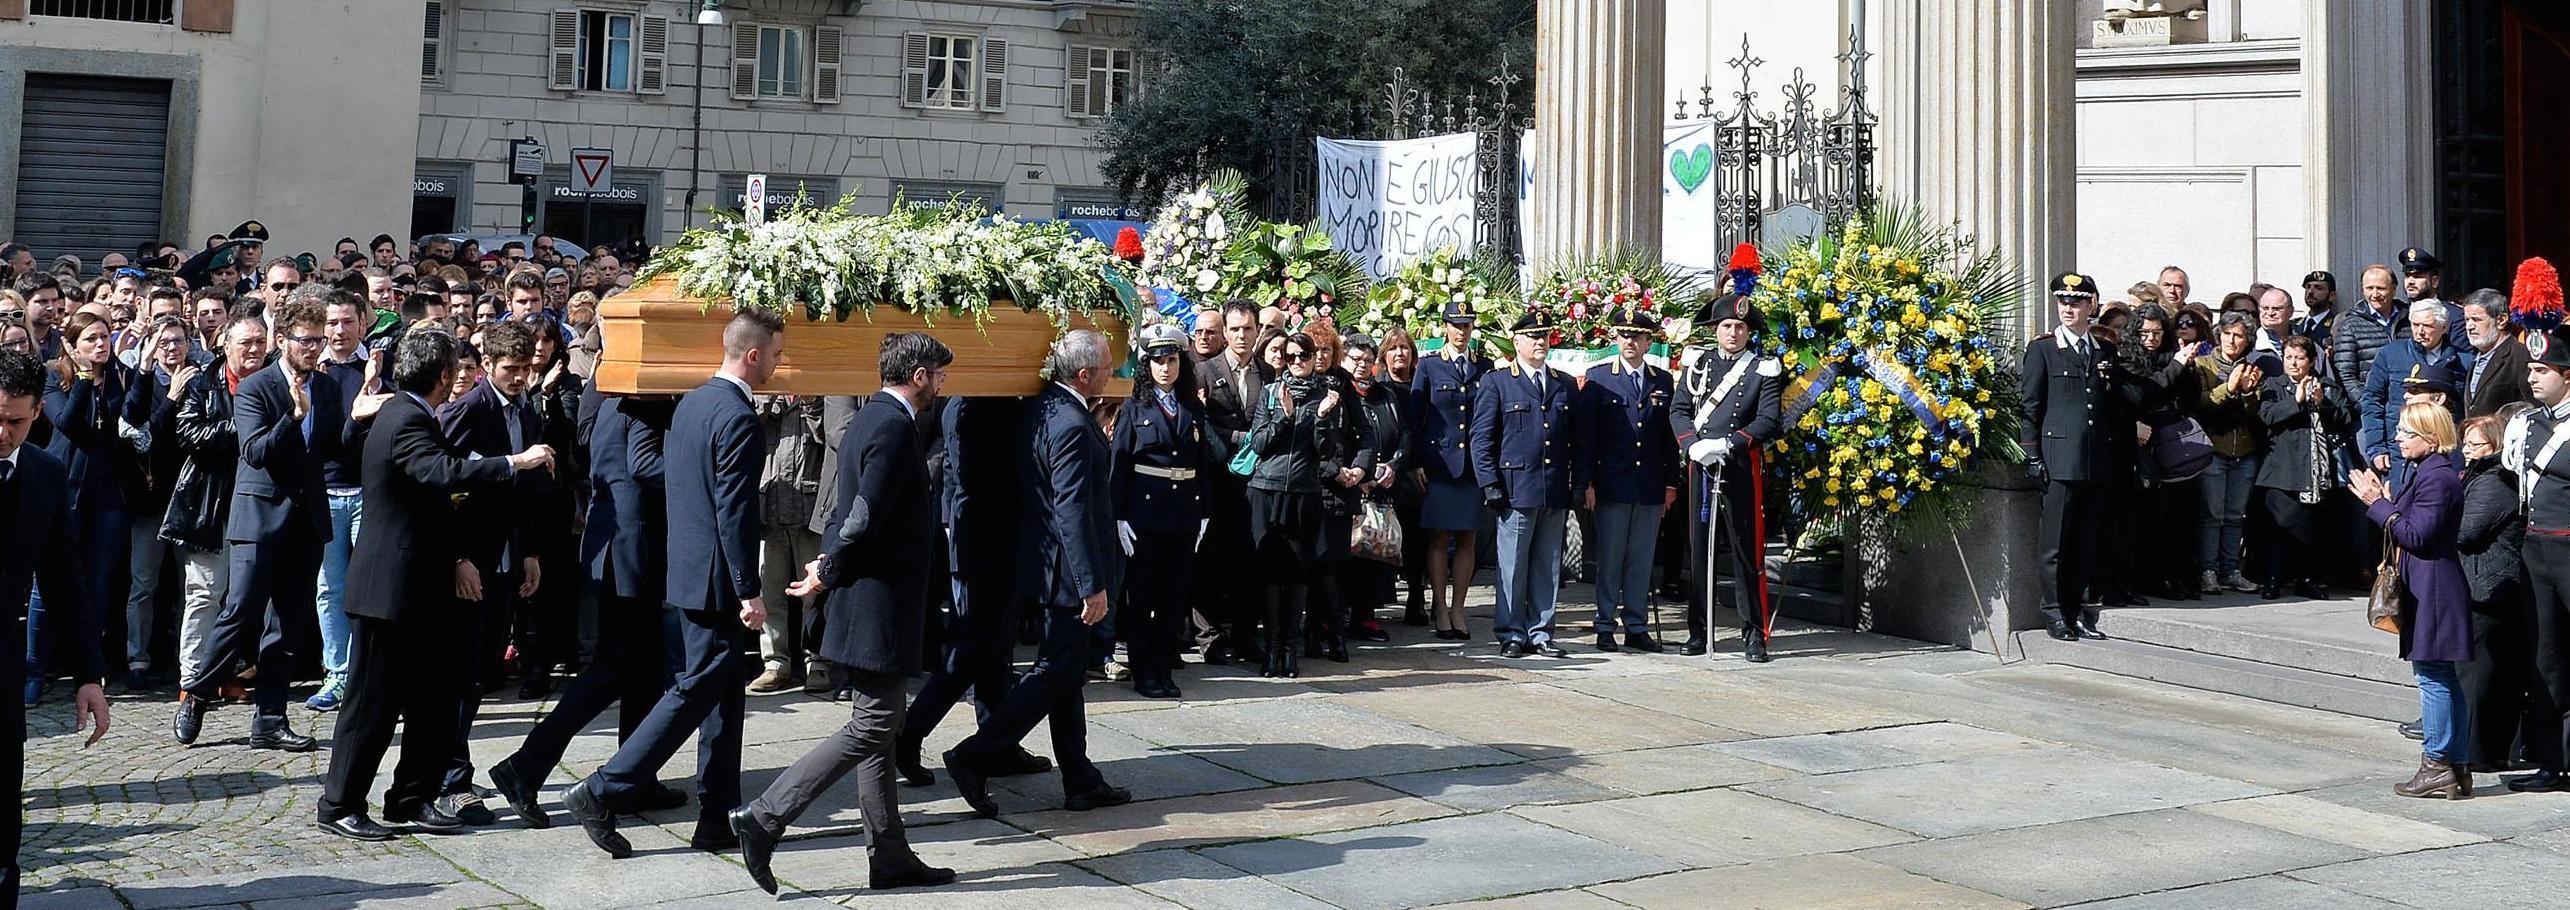 Funerali a Torino